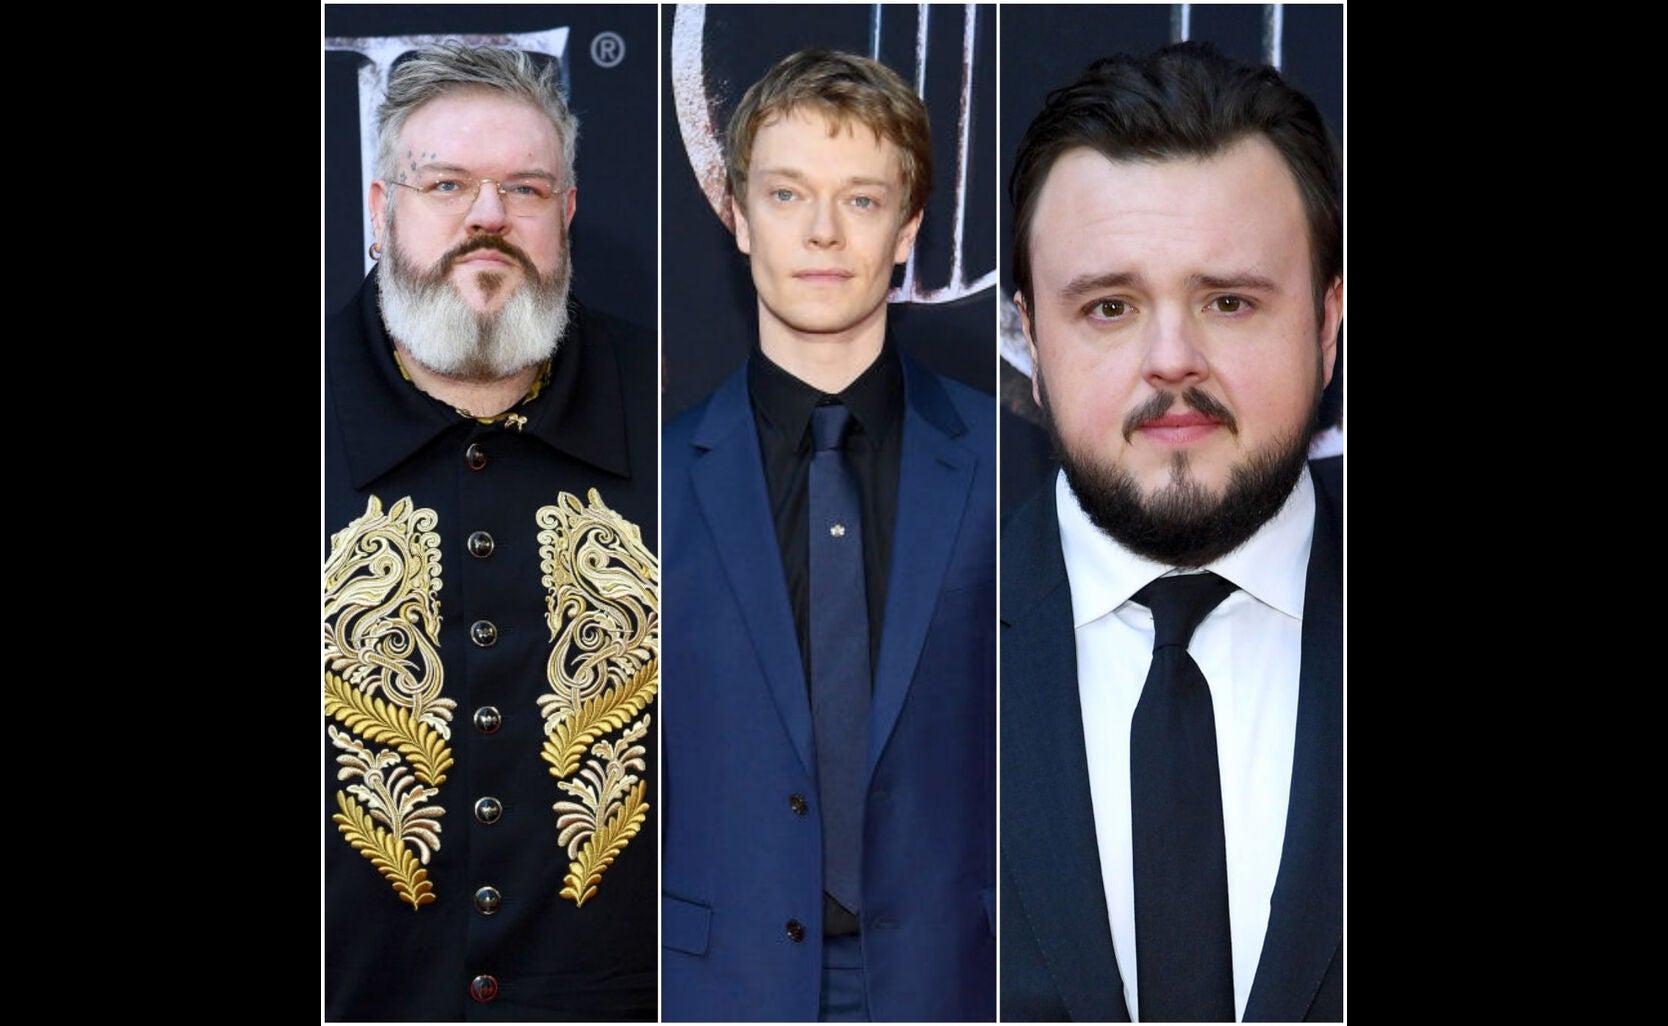 Kristian Nairn, Alfie Allen, John Bradley at the premiere of s8 of Game of Thrones